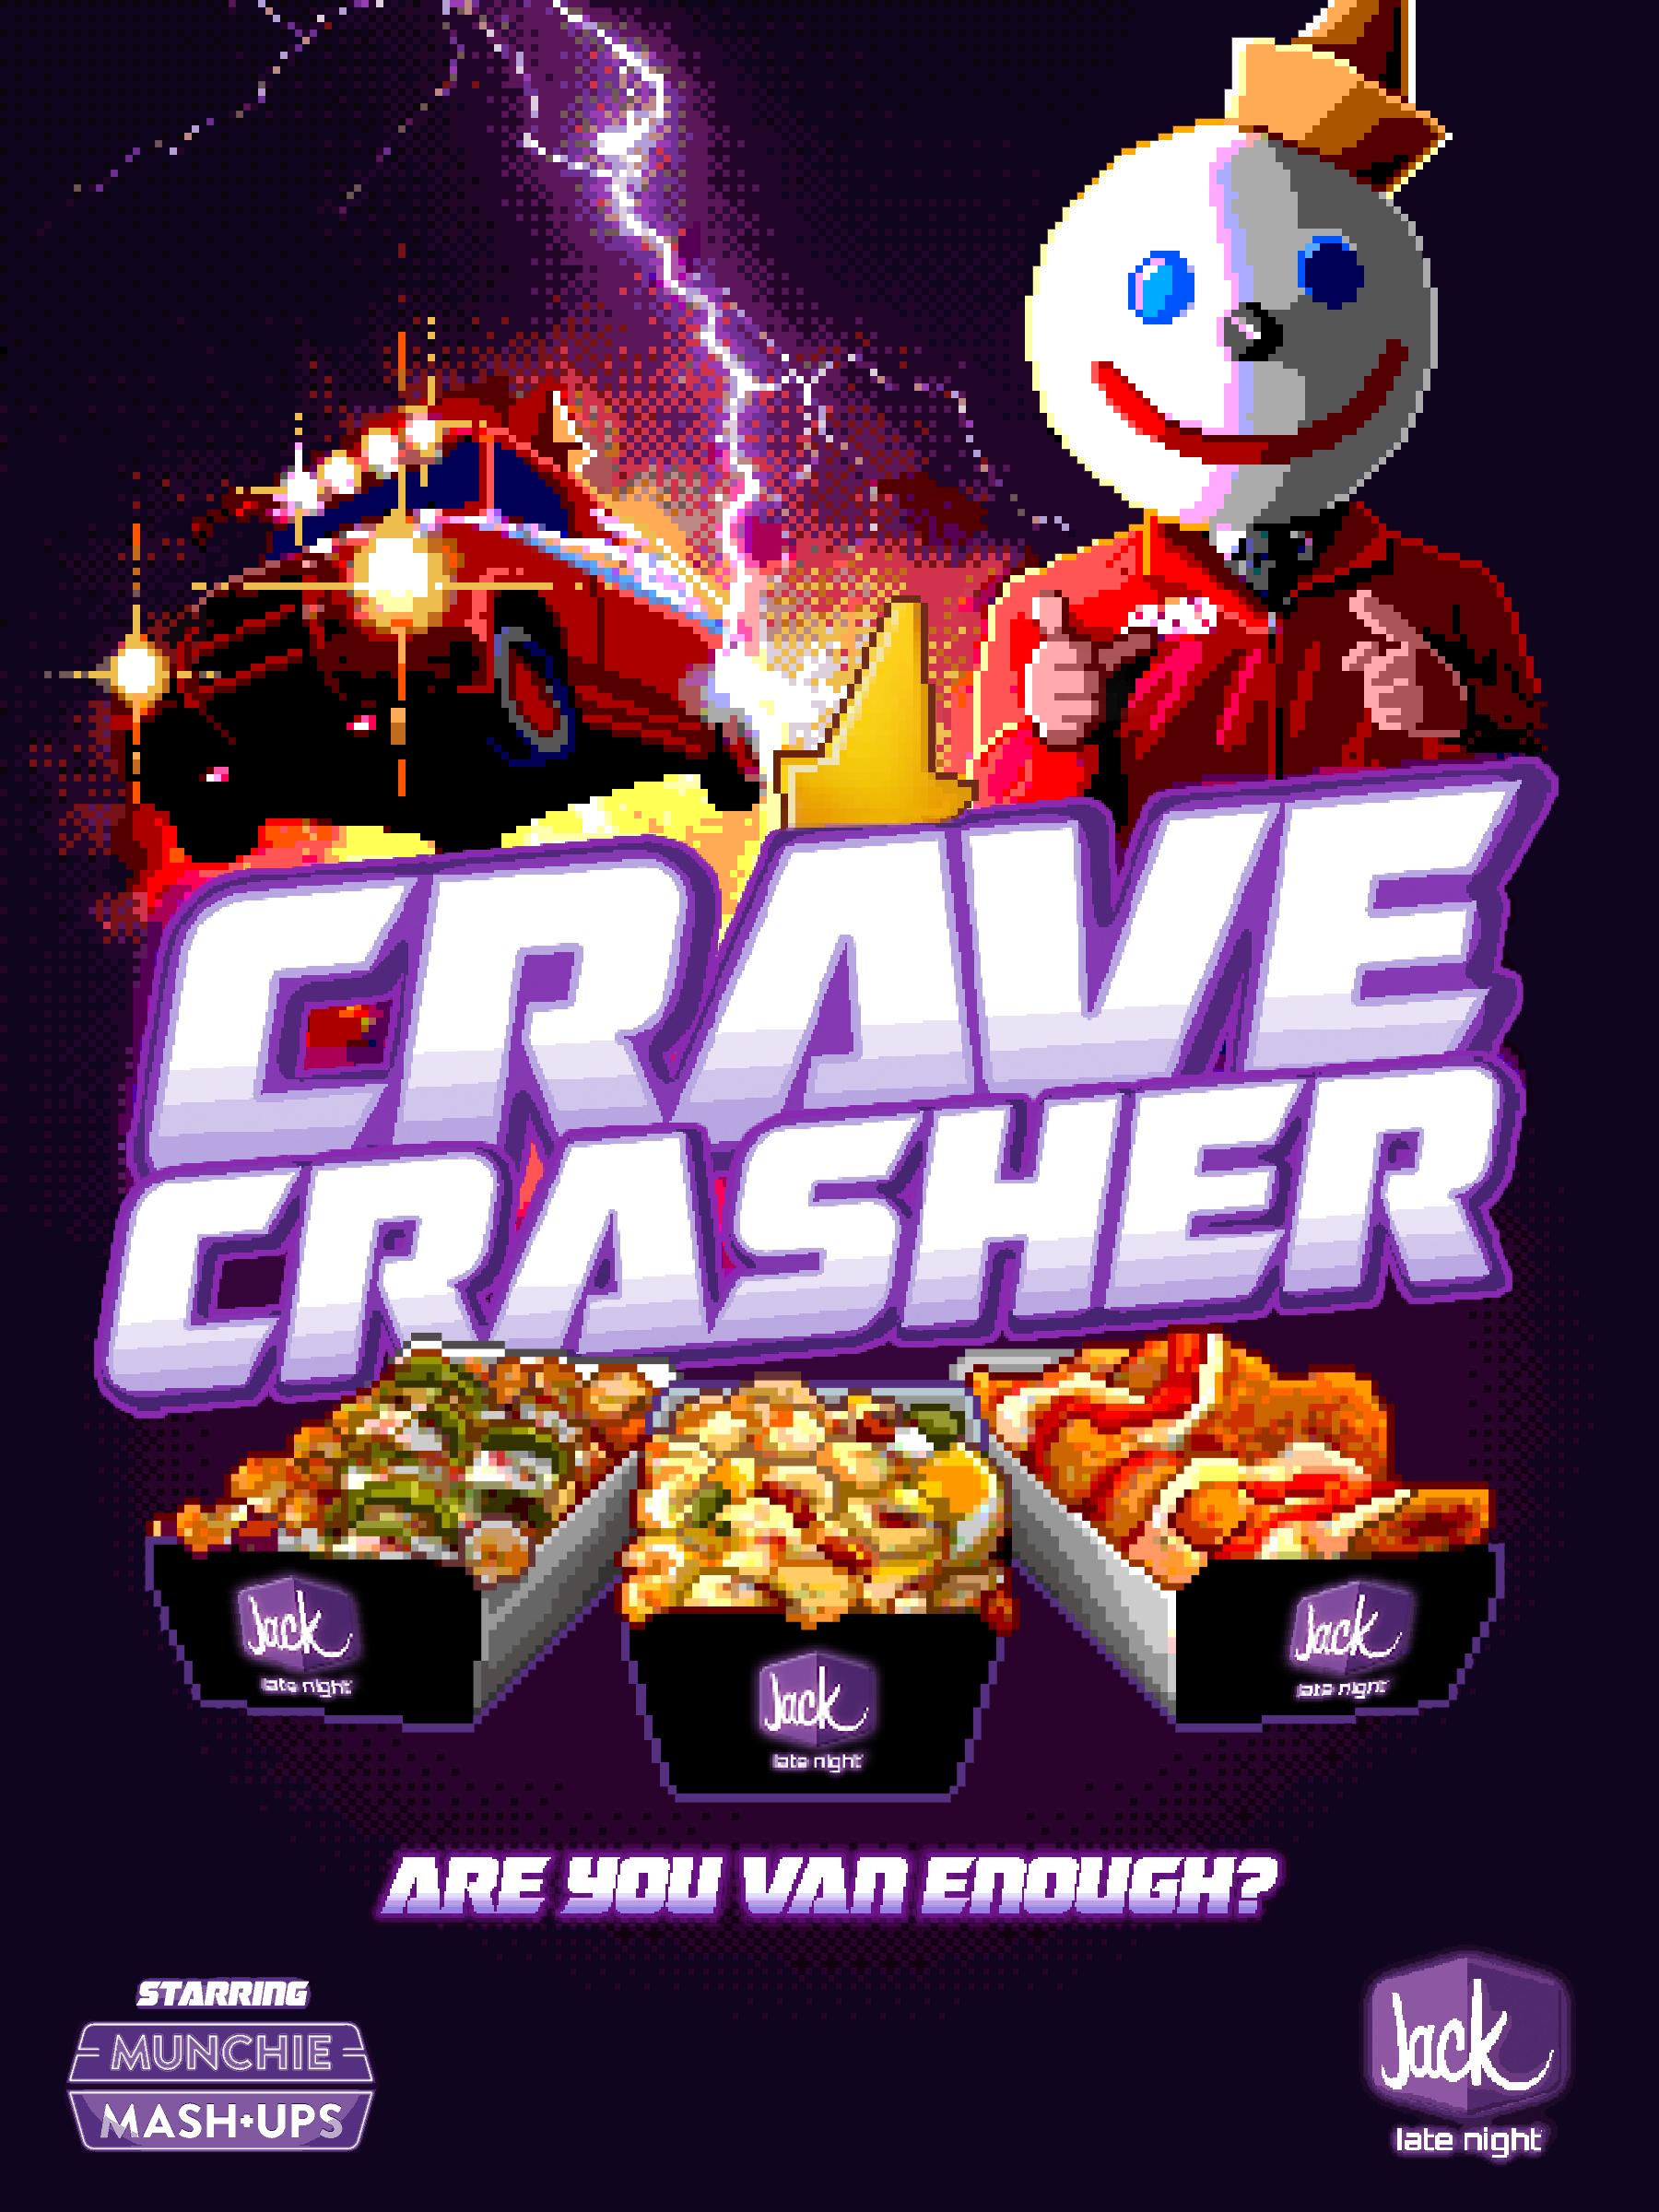 CraveCrasher_Poster_8BIT.jpg